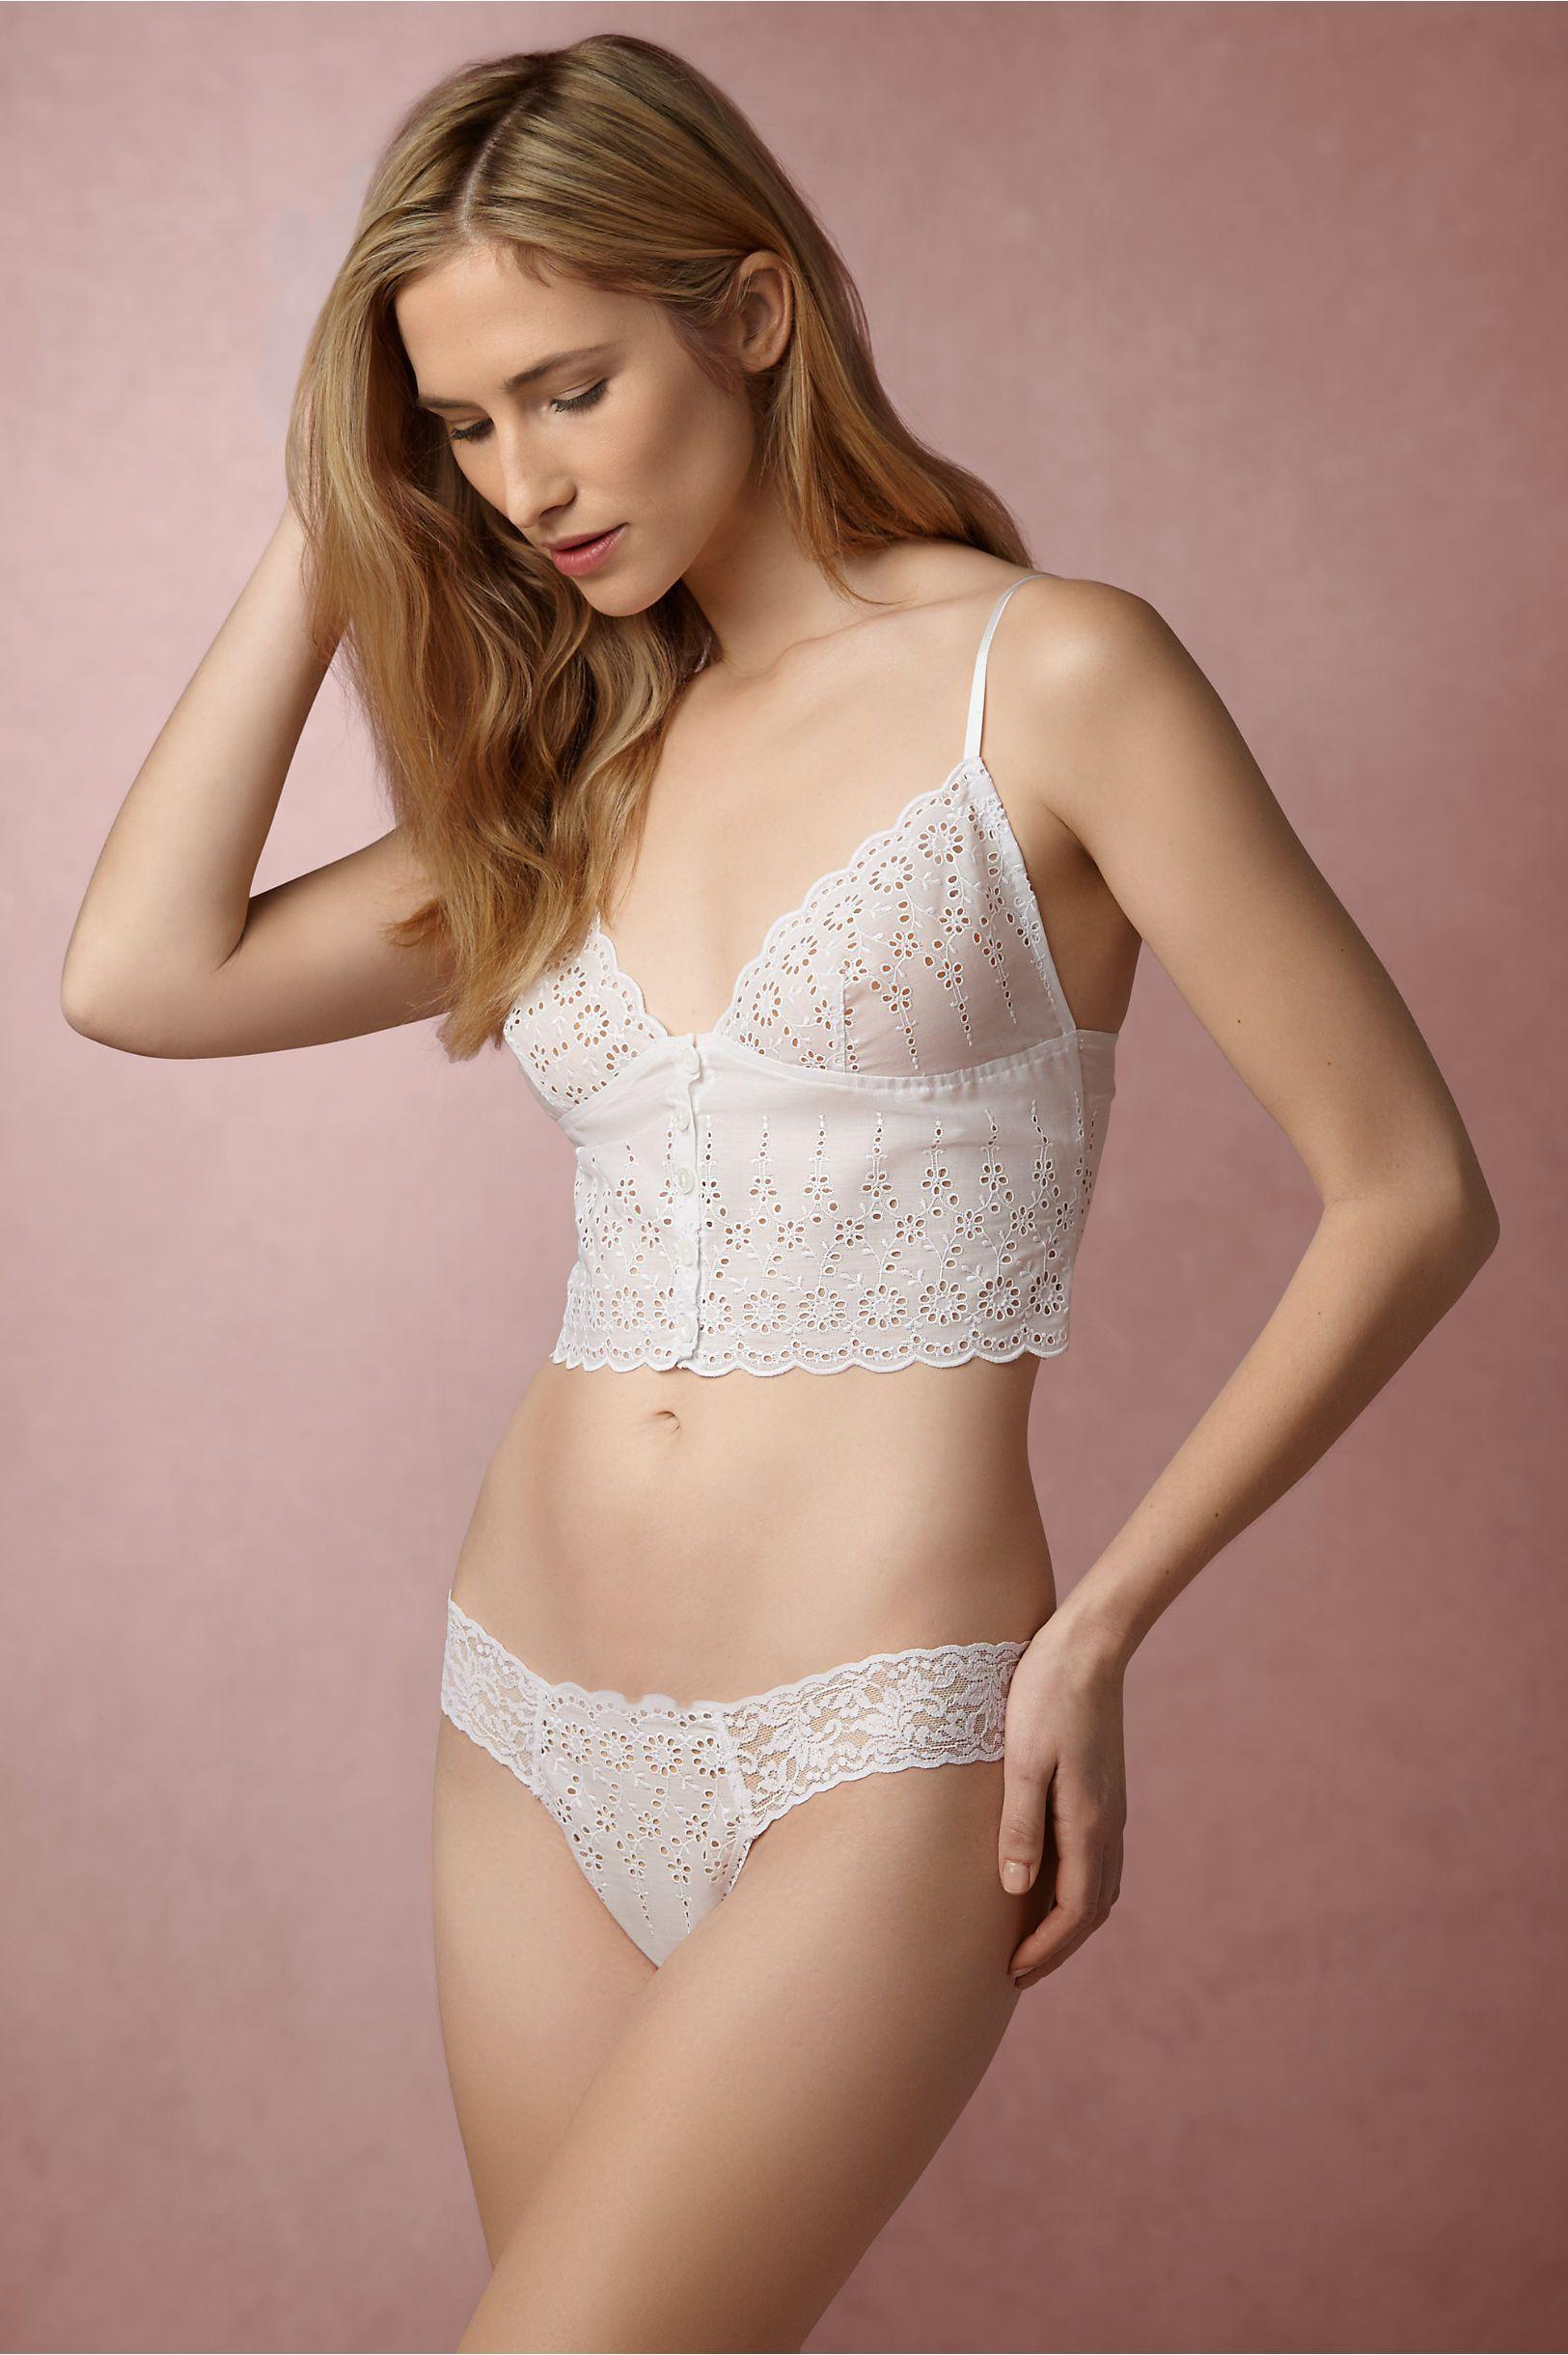 Laura hamilton lingerie nude (65 image)